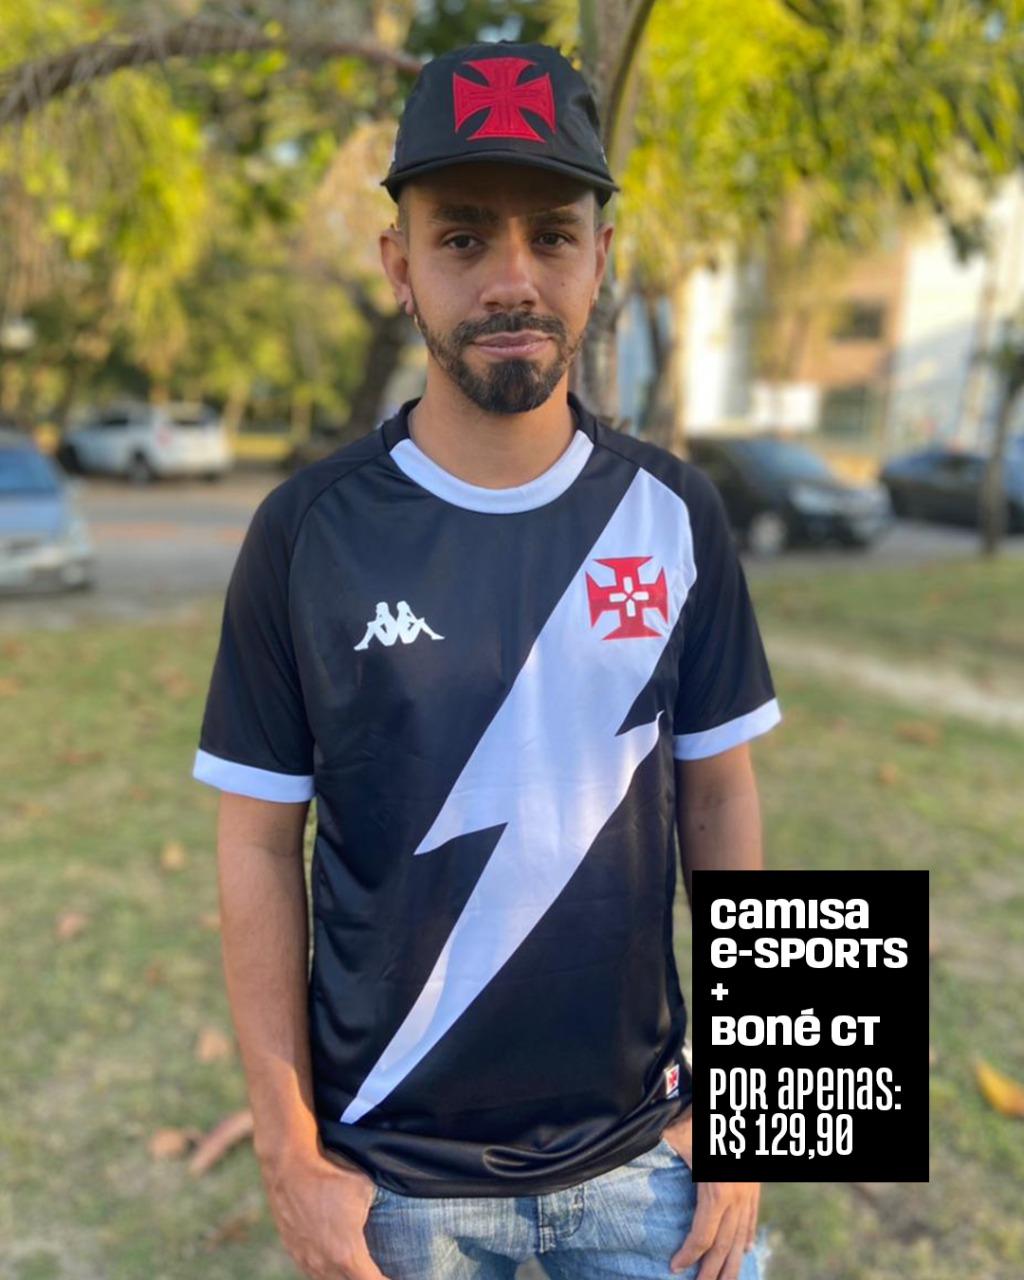 PROMOÇÃO - Camisa Vasco Player Sports + Boné Vasco CT